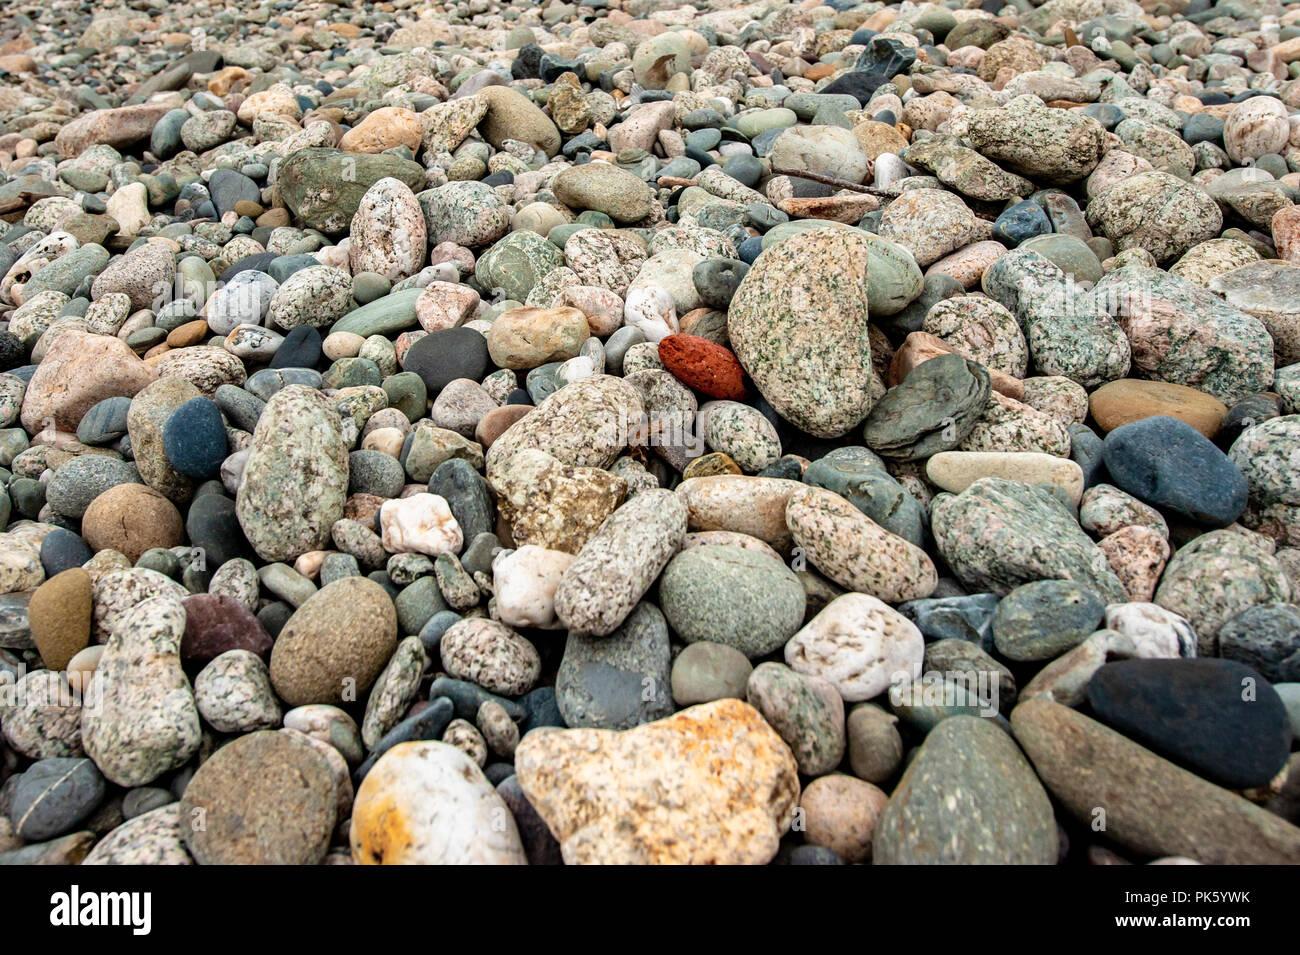 Rocky beach / landscape w/ smooth sea stones - Newport Rhode Island